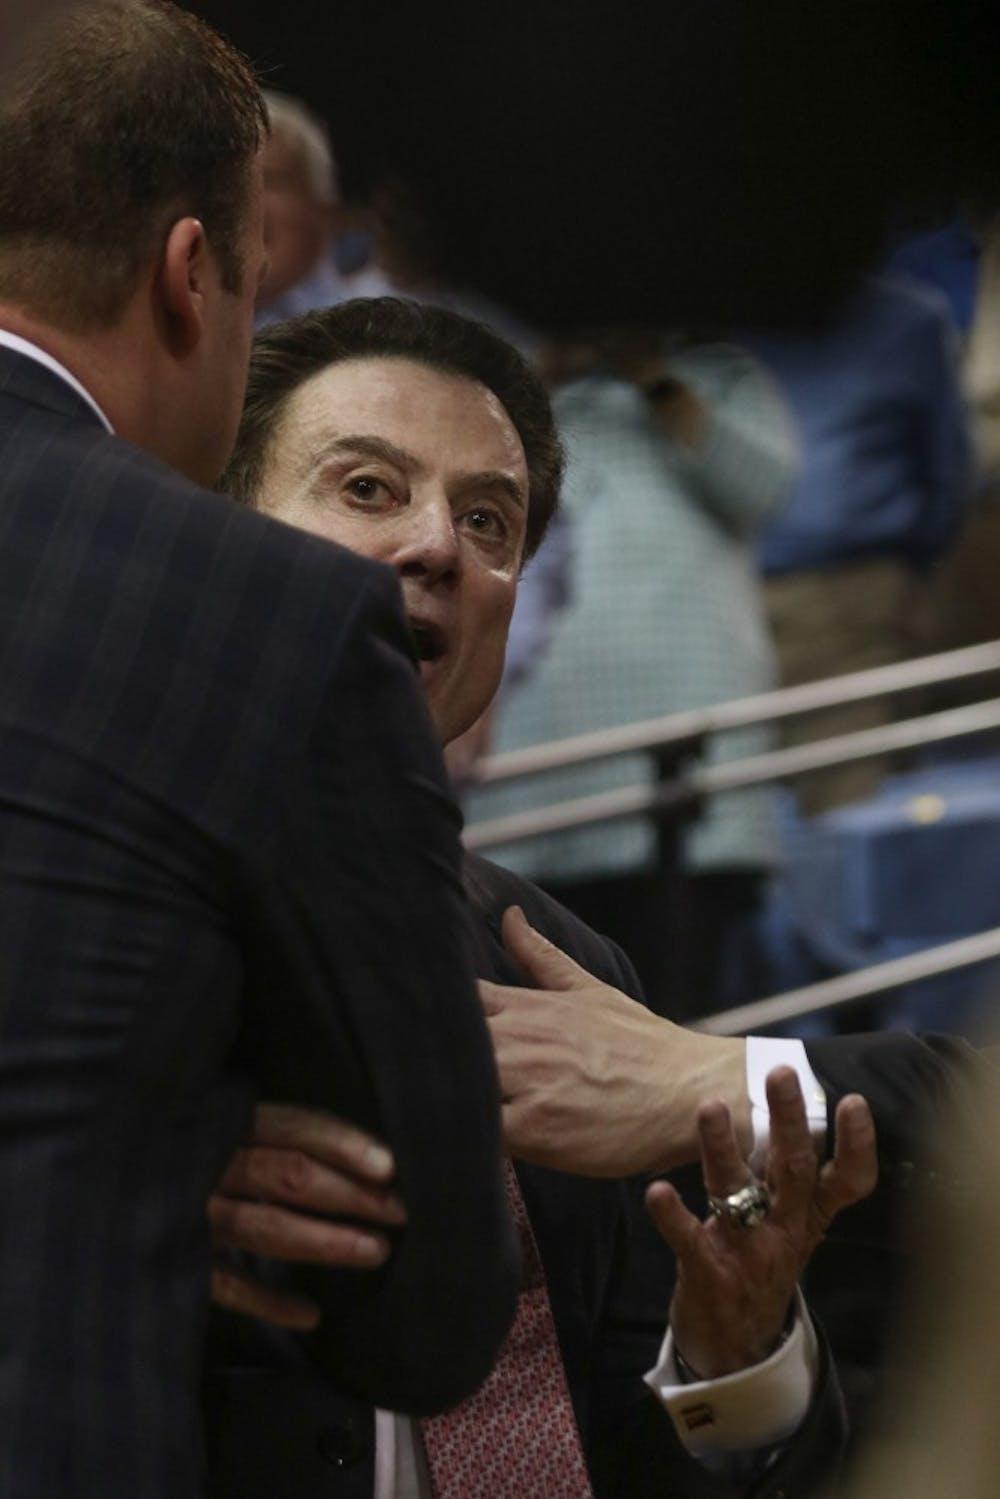 Takeaways from Louisville head coach Rick Pitino's meltdown